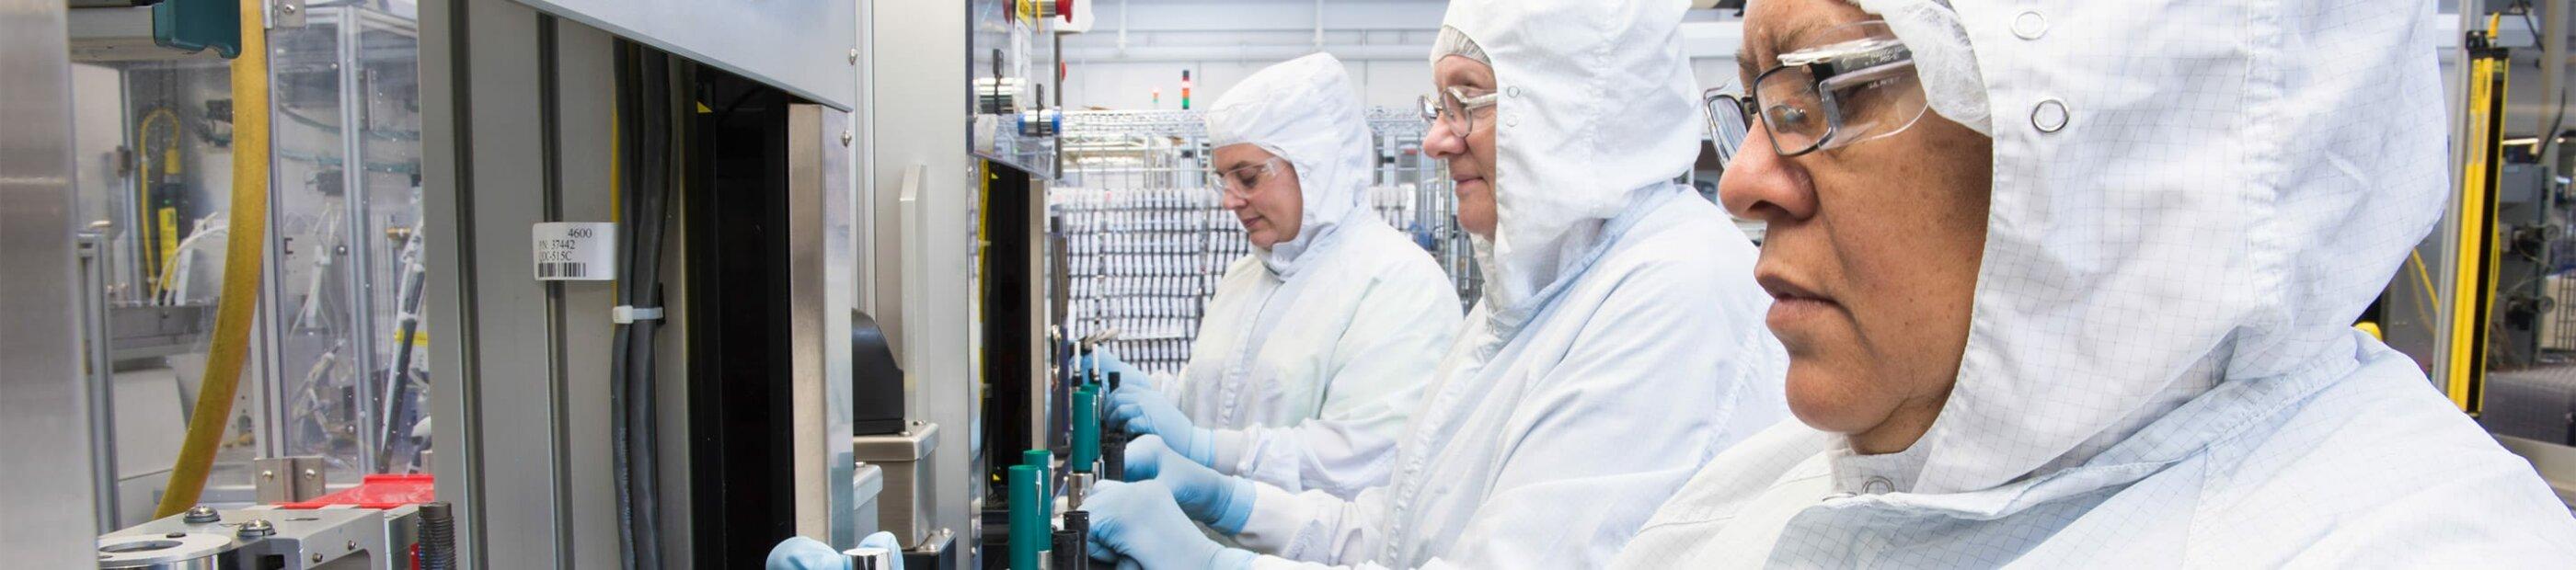 women in white hazmat suit working on machines